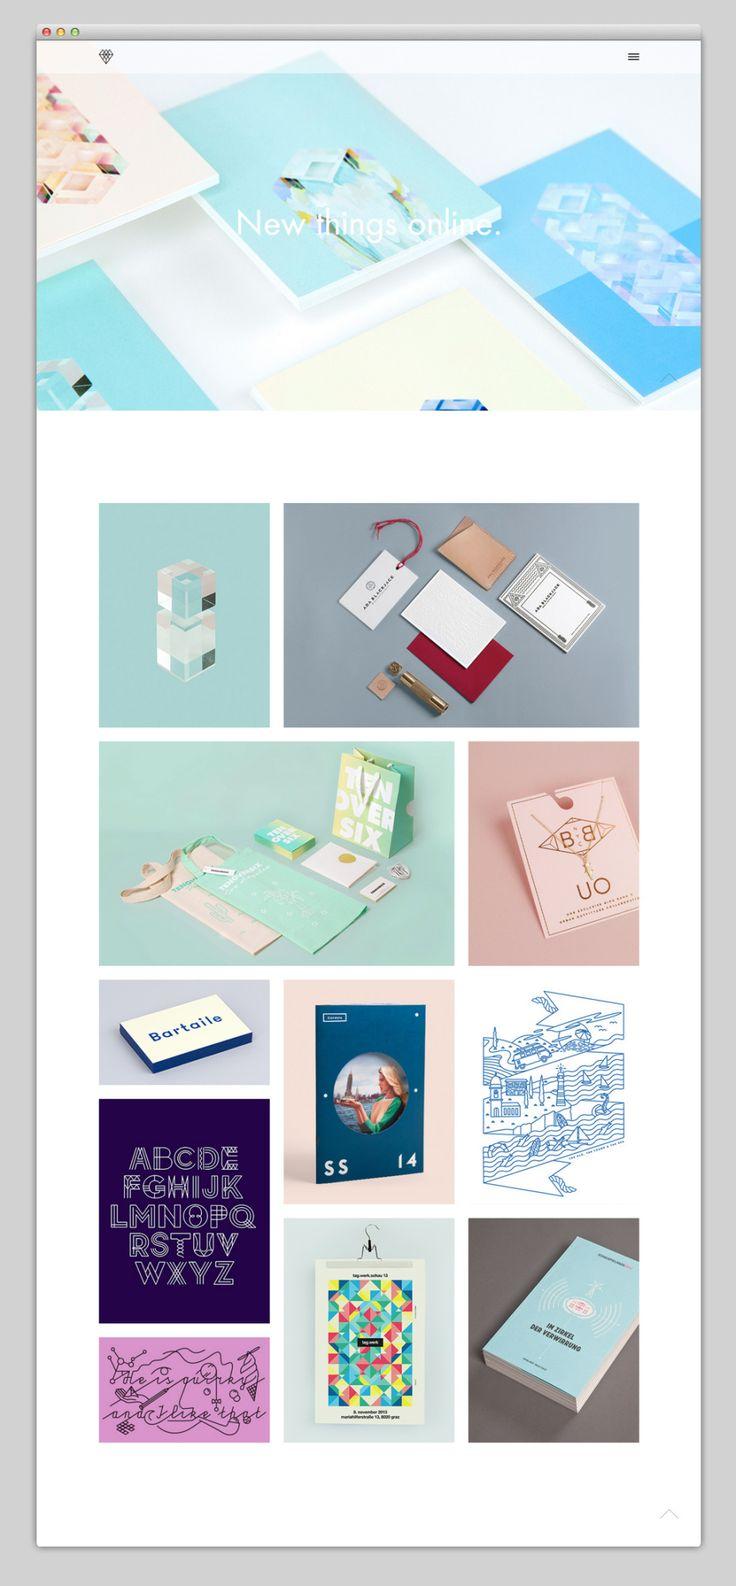 Verena Michelitsch Website Landing Page Design   Minimal grid based website design